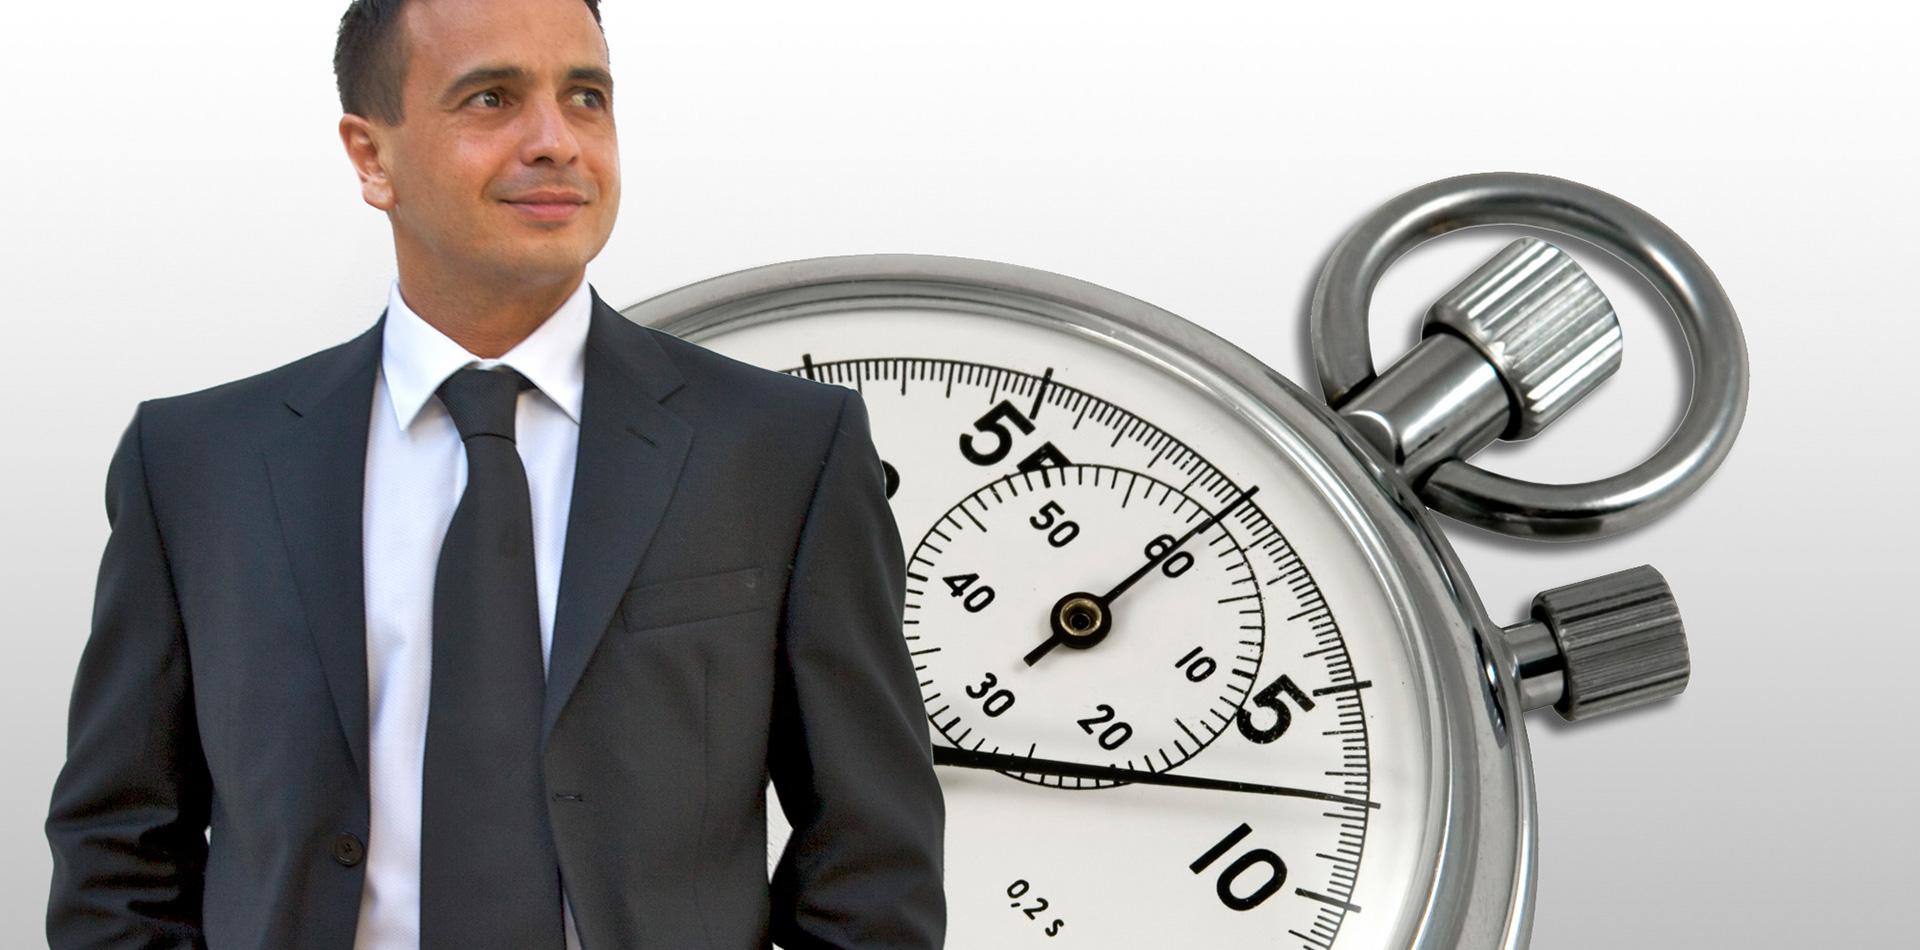 said-clock